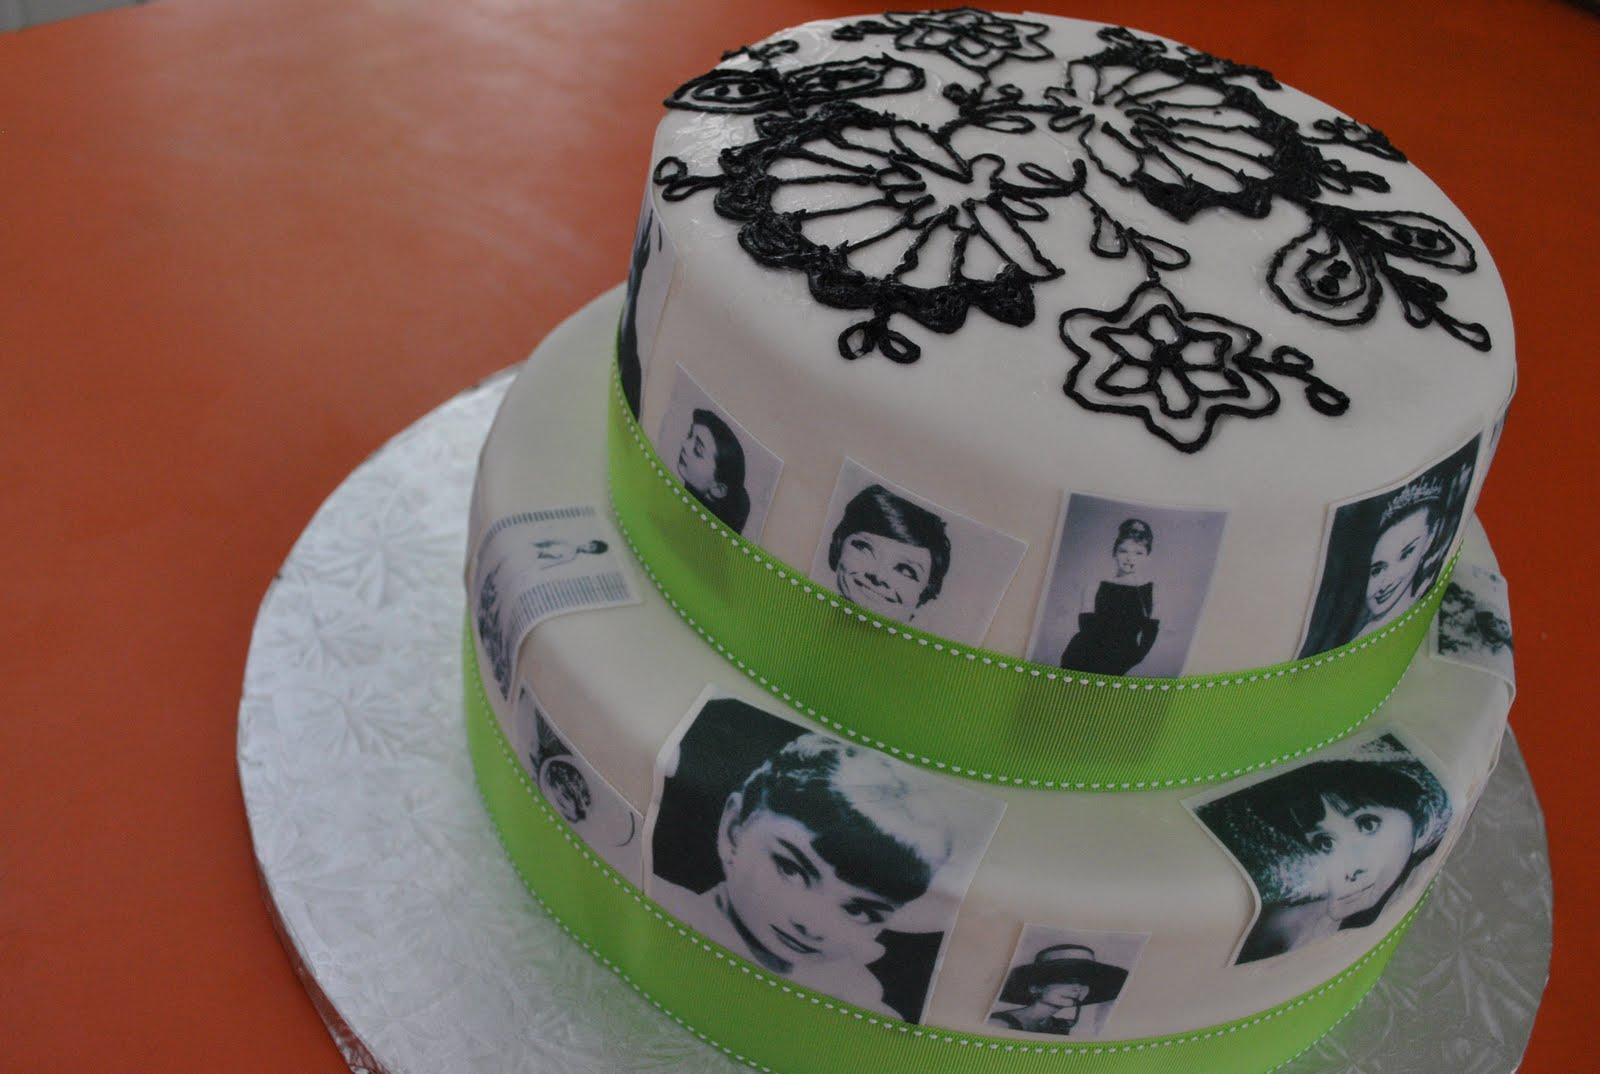 Local Edible Cake Images : Pure Imagination: Audrey Hepburn Cake